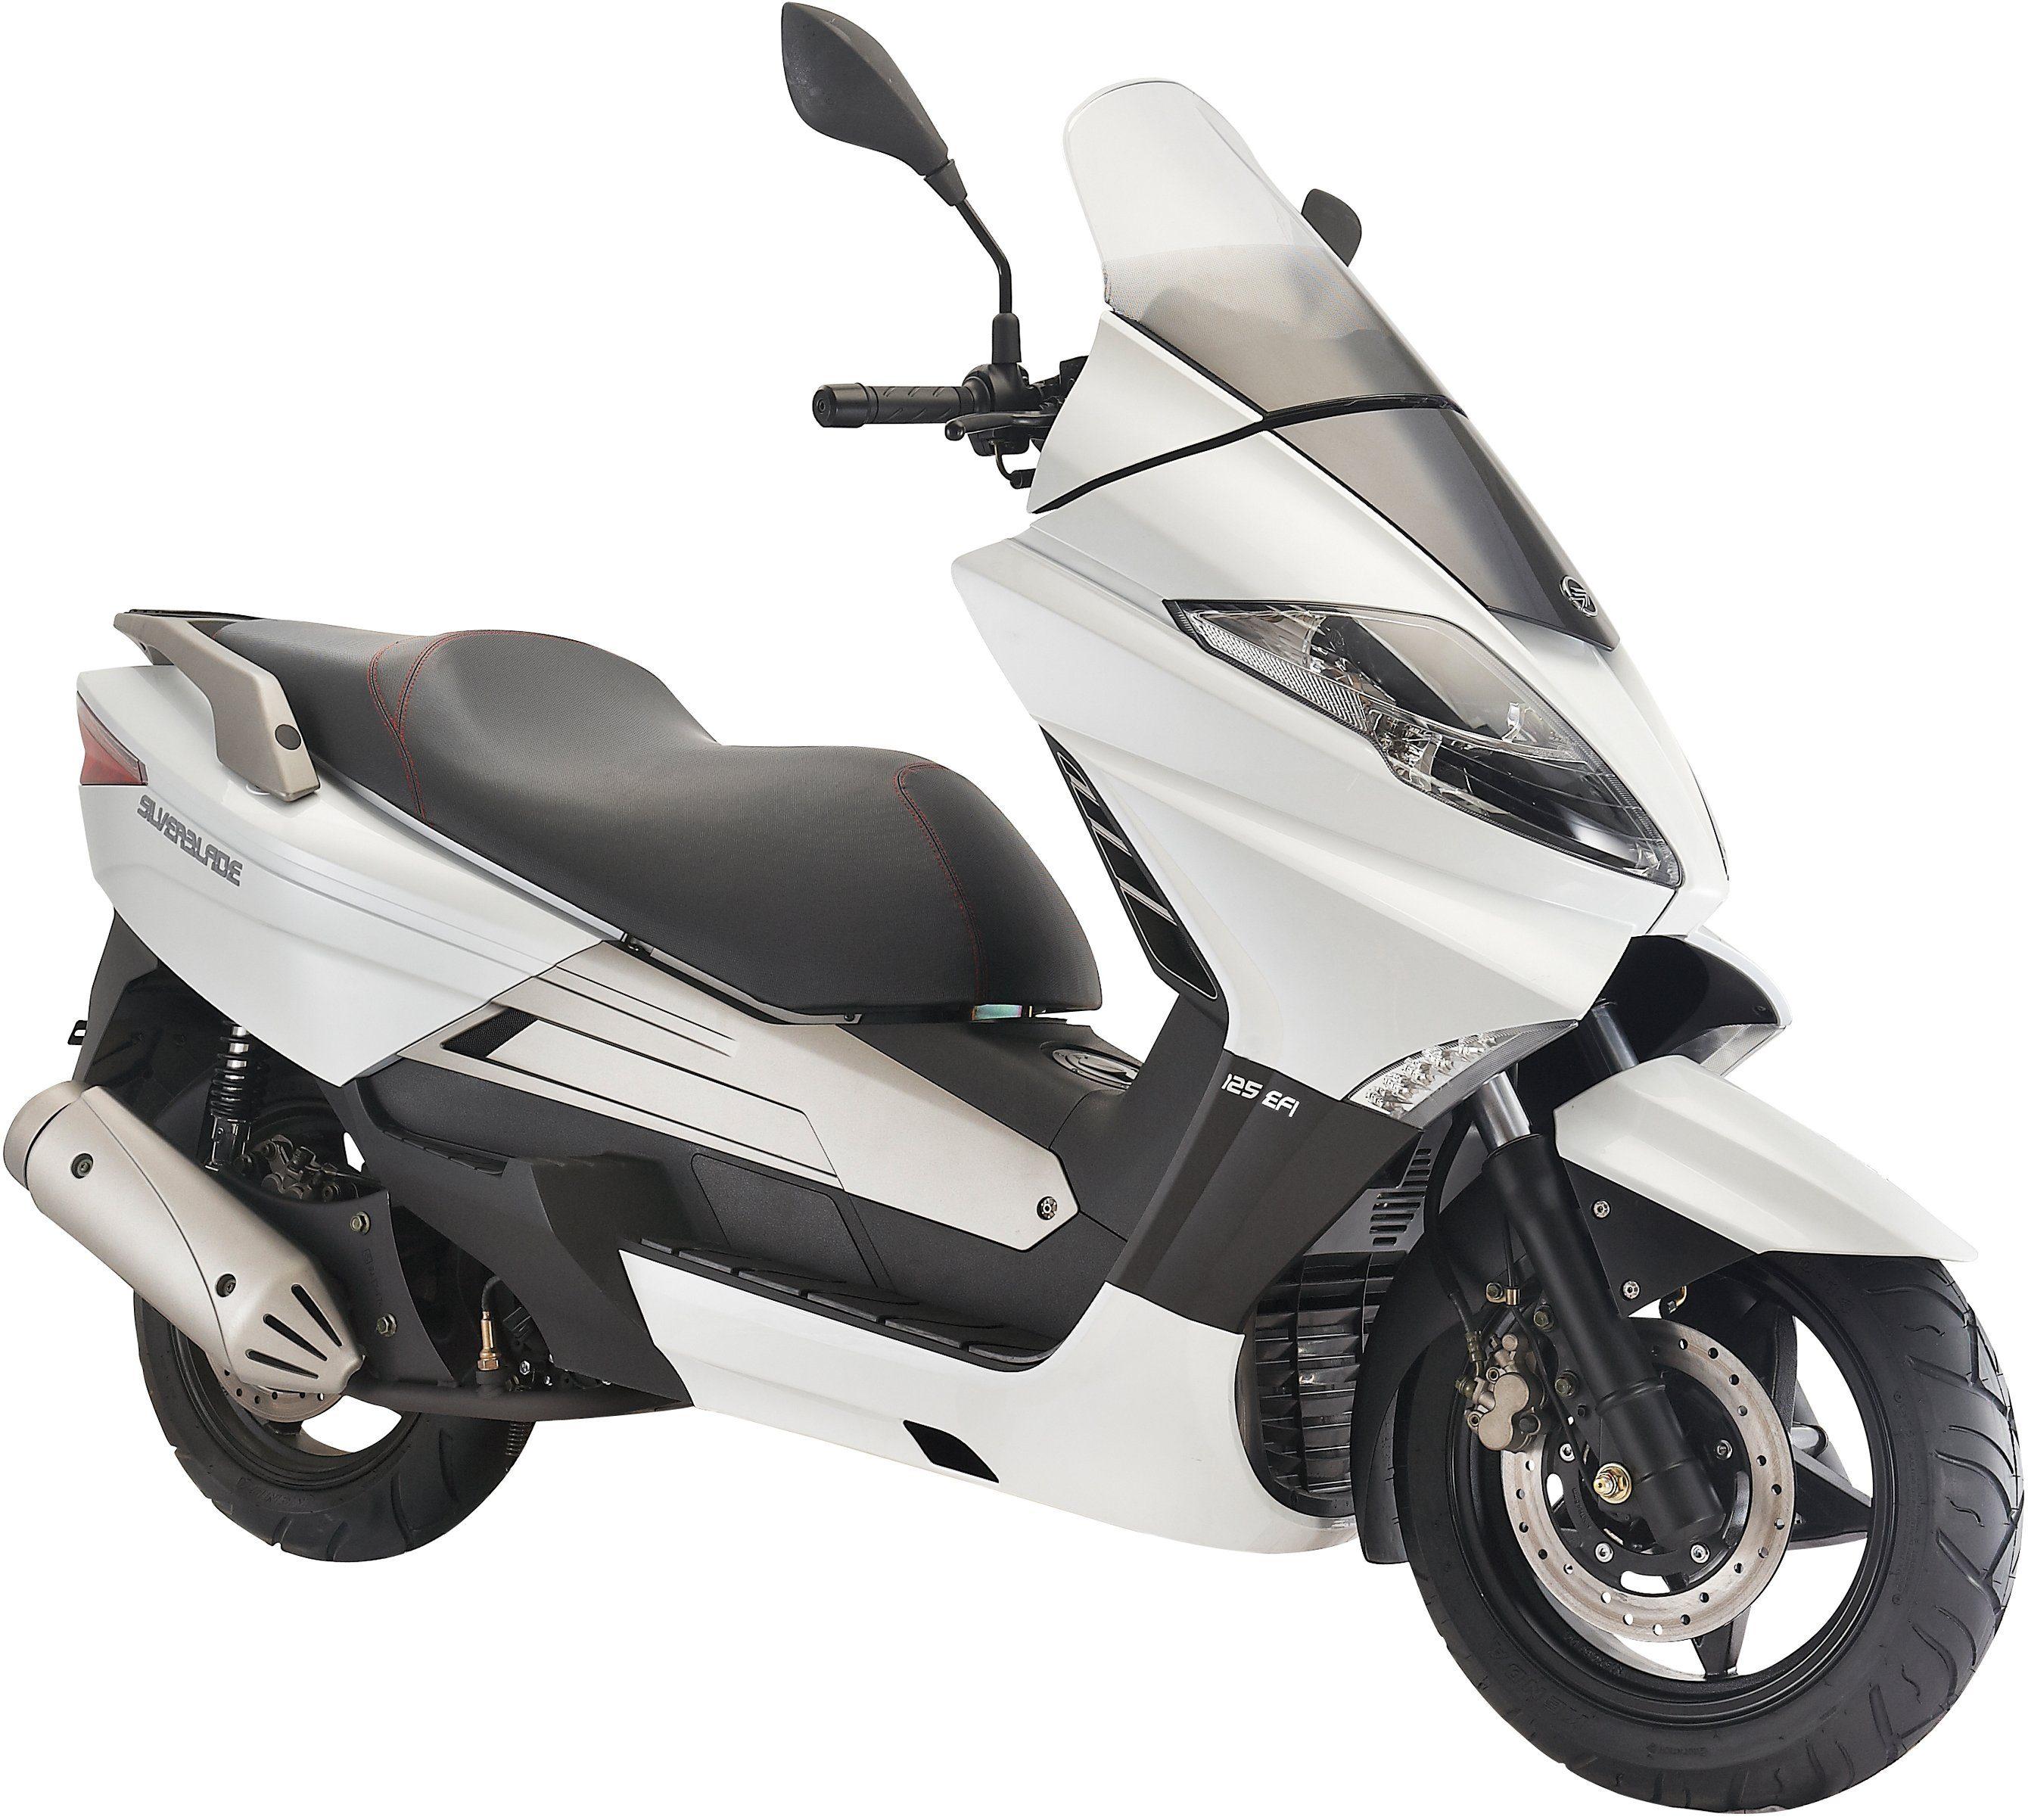 Keeway Motorroller, 250 ccm, 115 km/h, »Silver Blade«